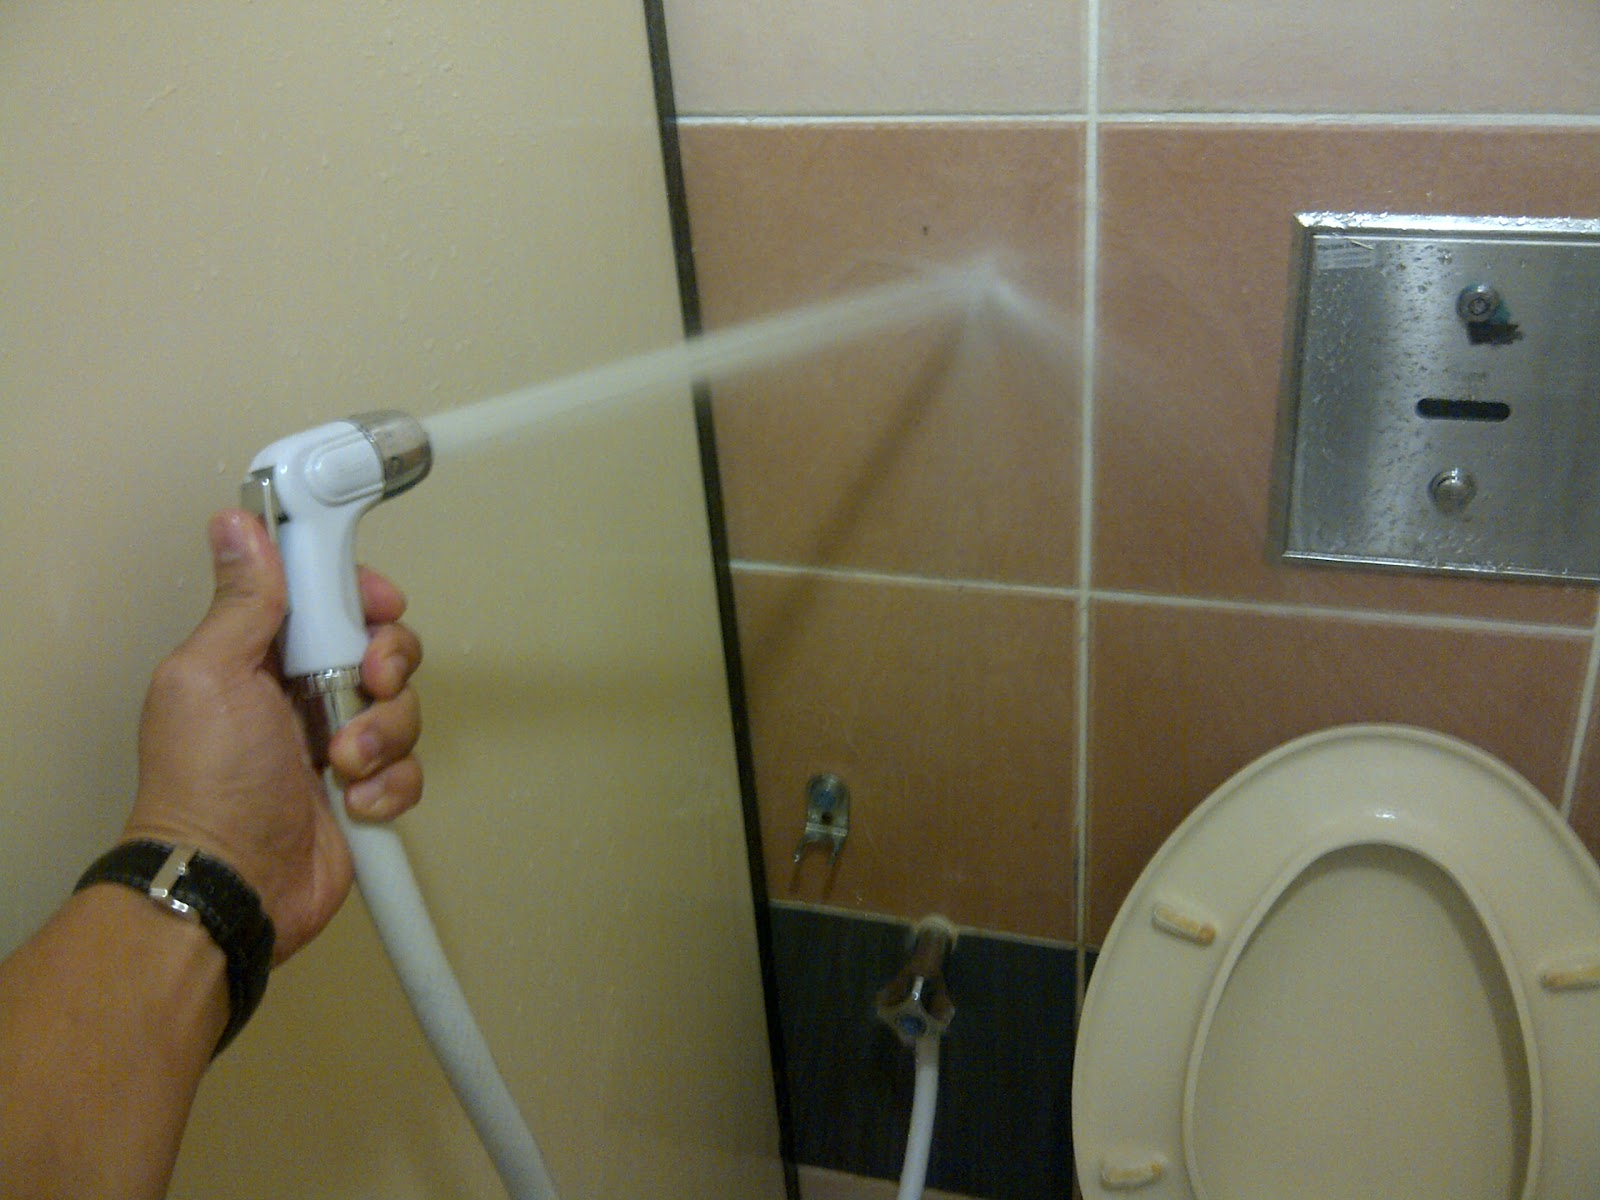 orang aku pun sibuk nak jugak nozzle spray on a hose in the loo fancy but